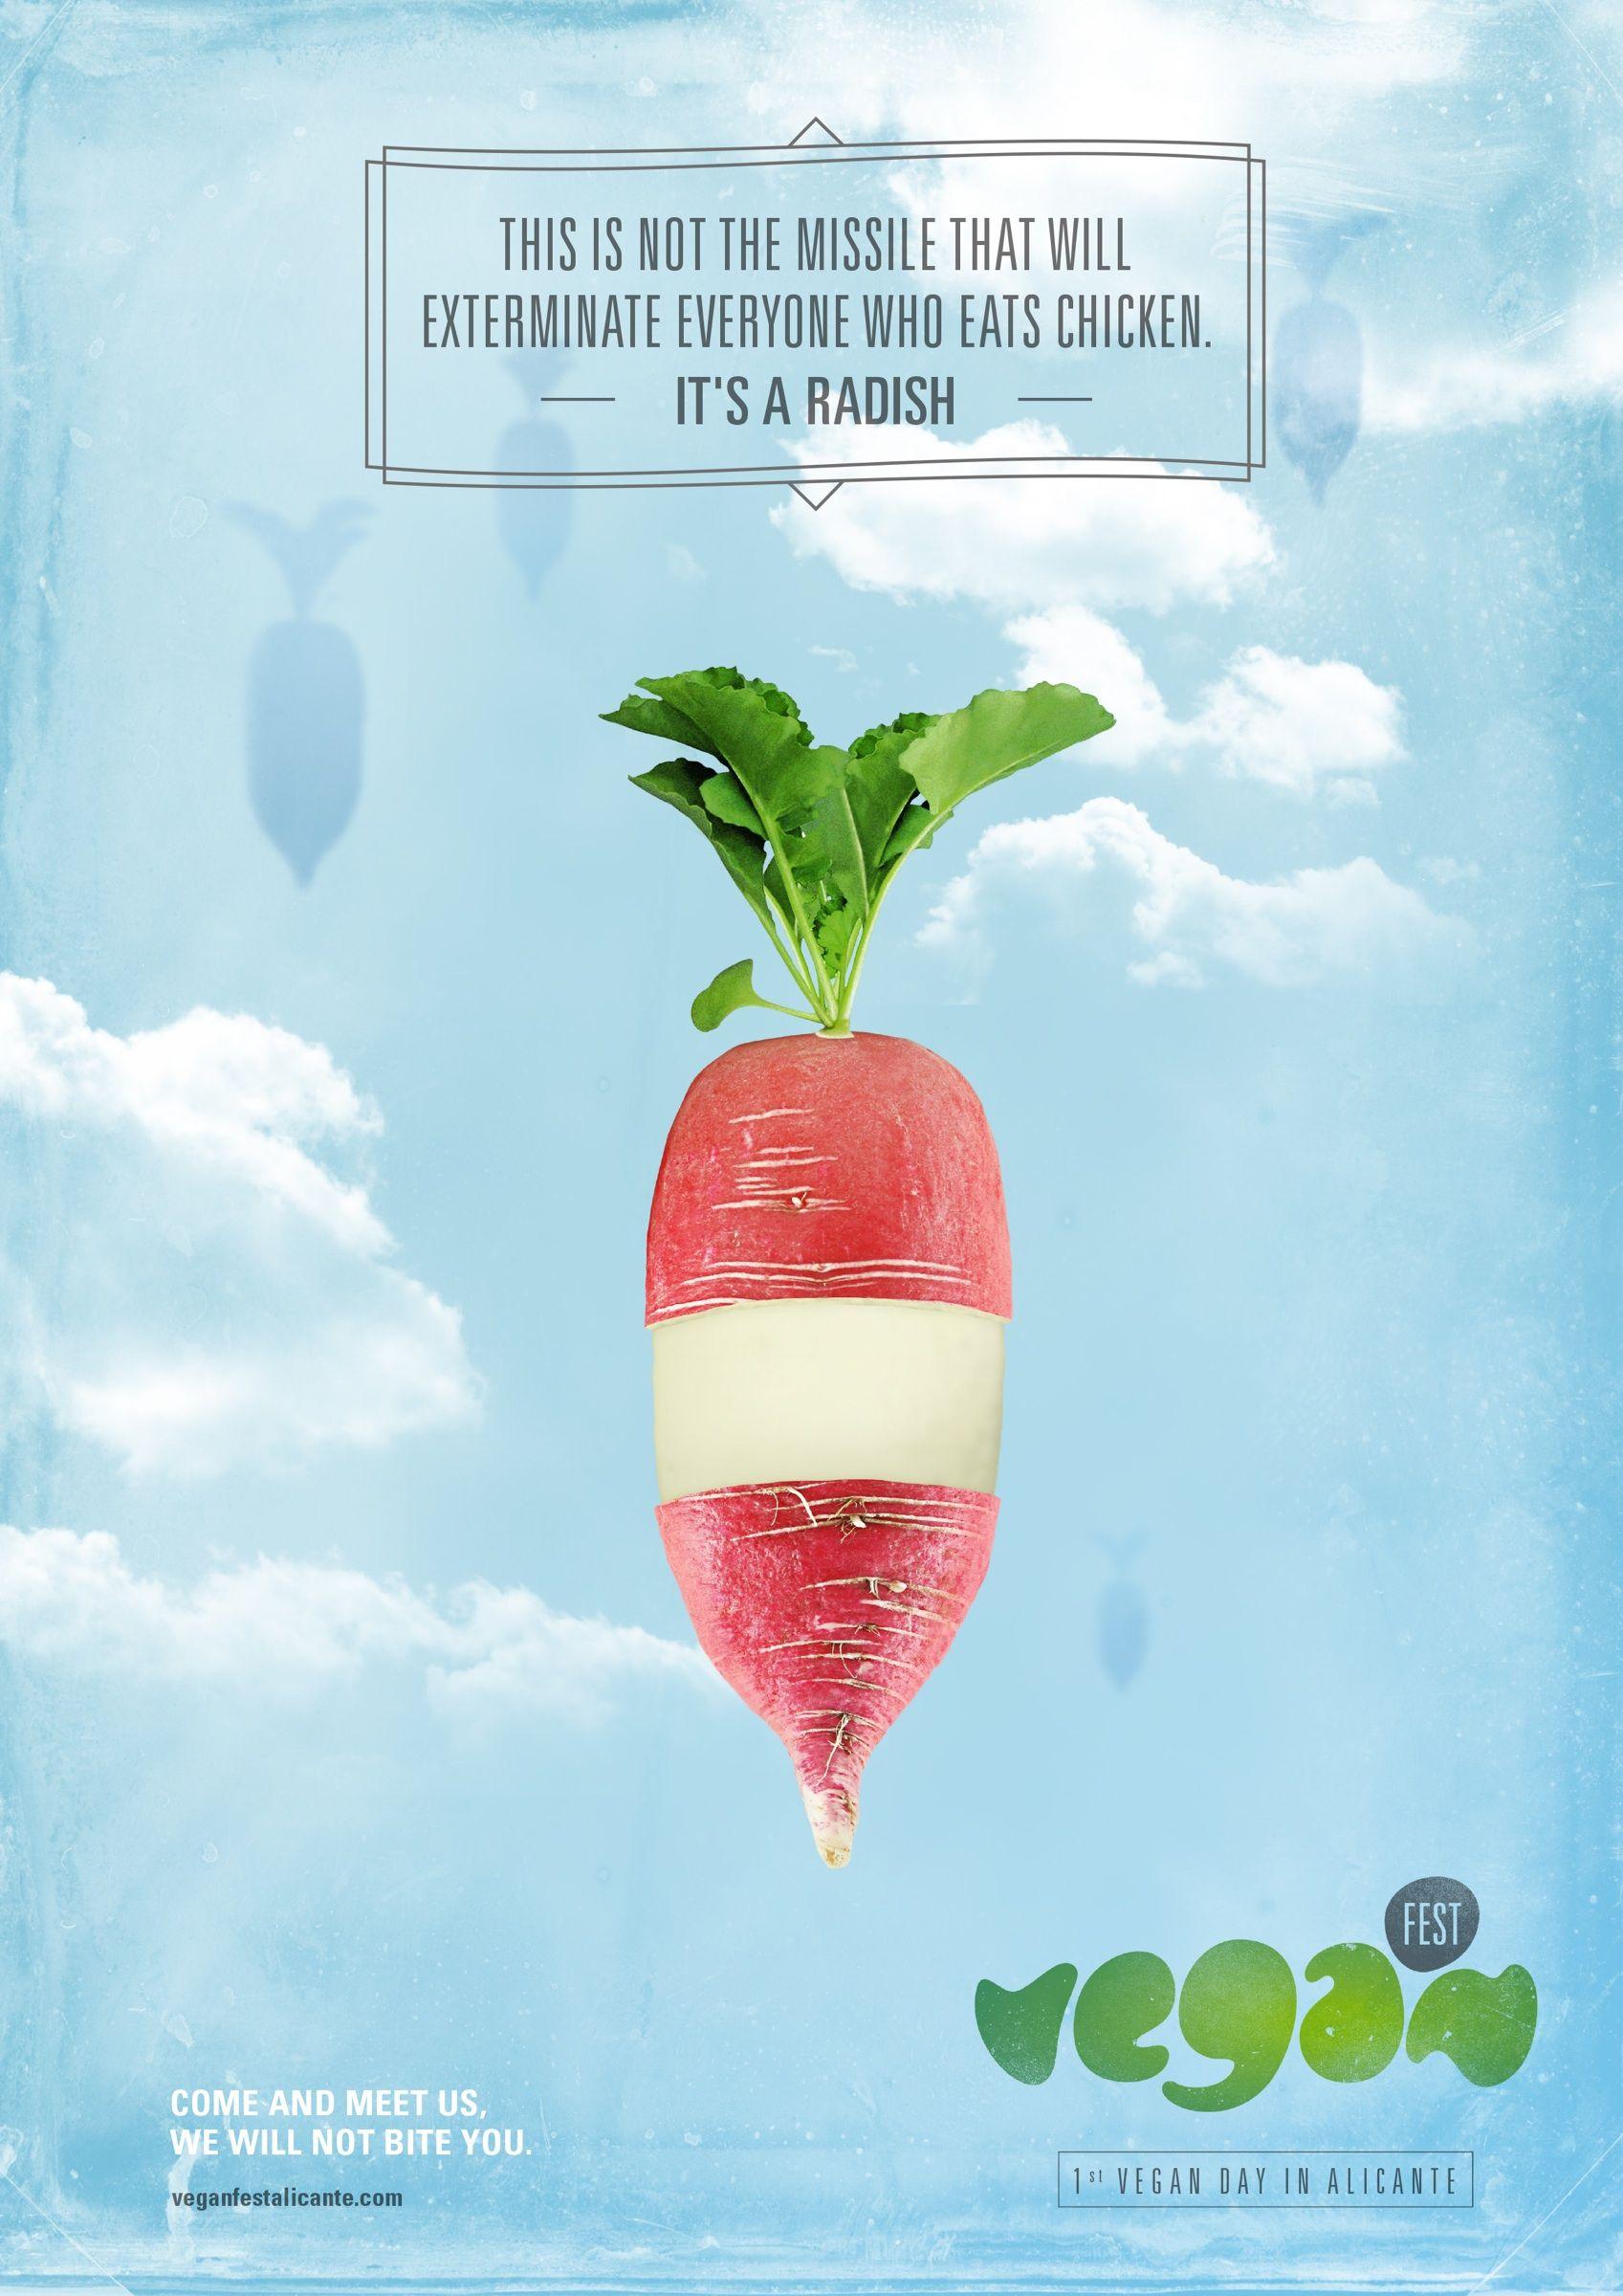 Vegan Fest Alicante Radish Ads Of The World Food Festival Poster Green Marketing Creative Advertising Campaign